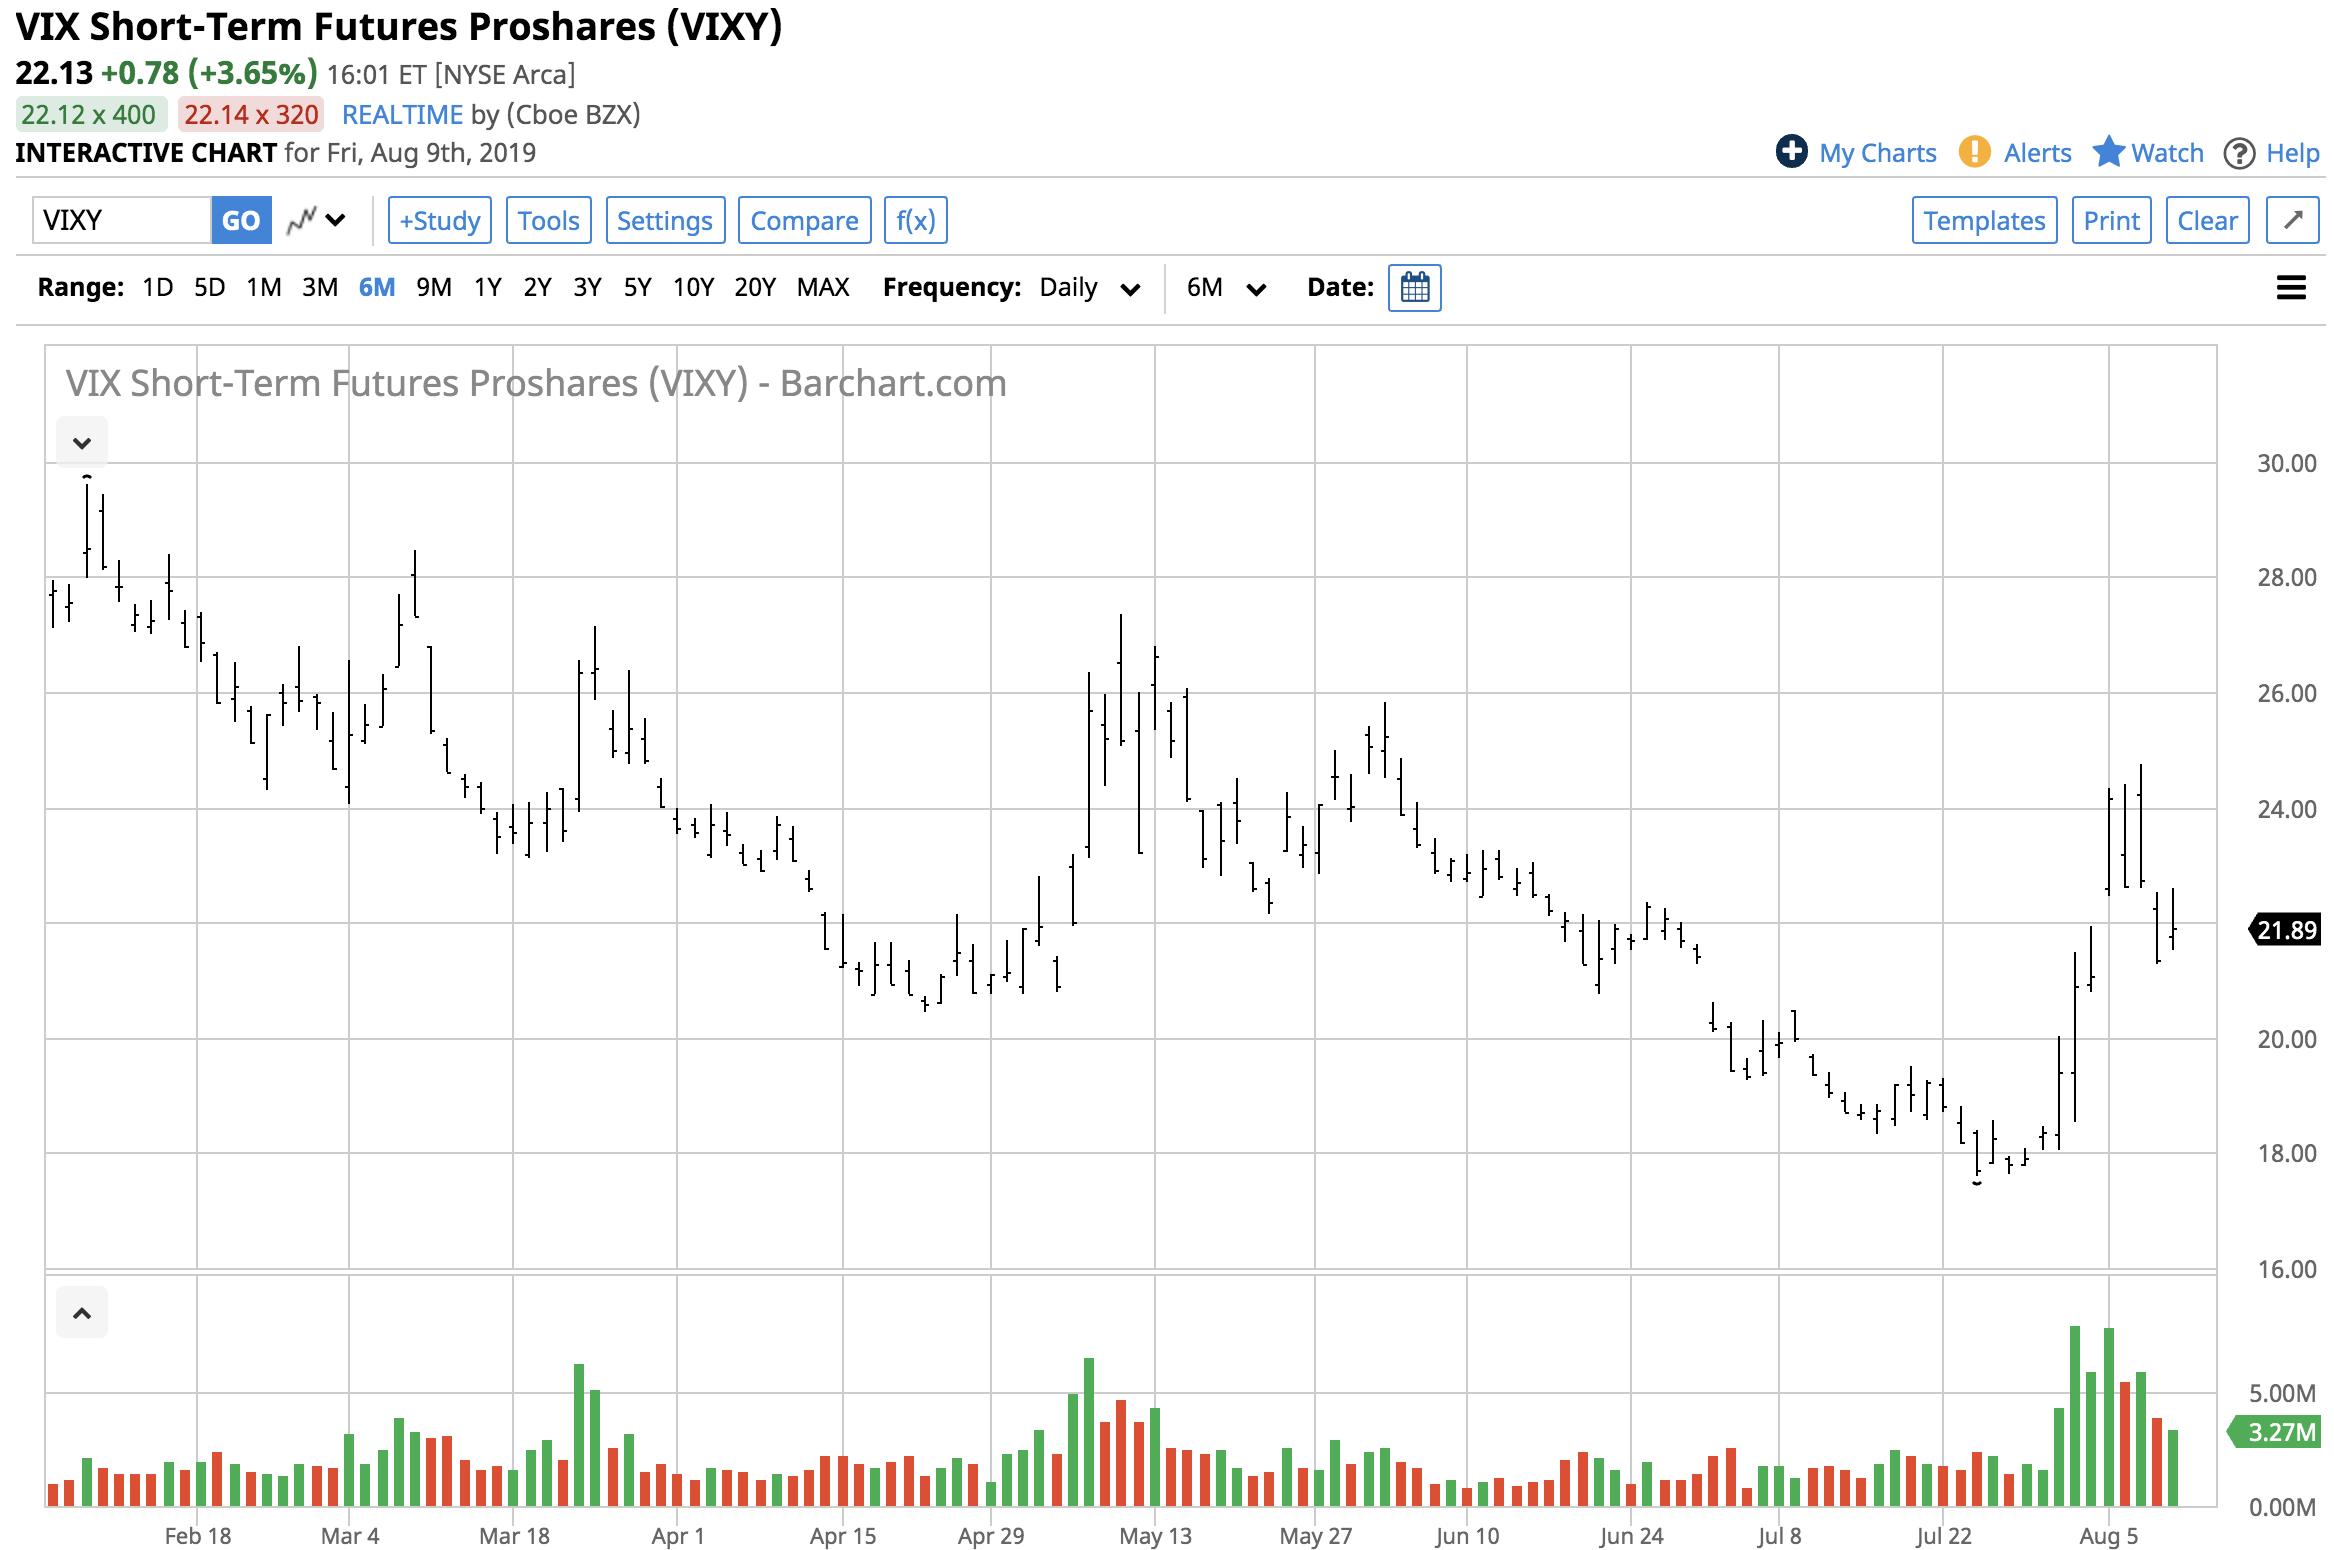 Wild Times In Stocks - ProShares VIX Short-Term Futures ETF